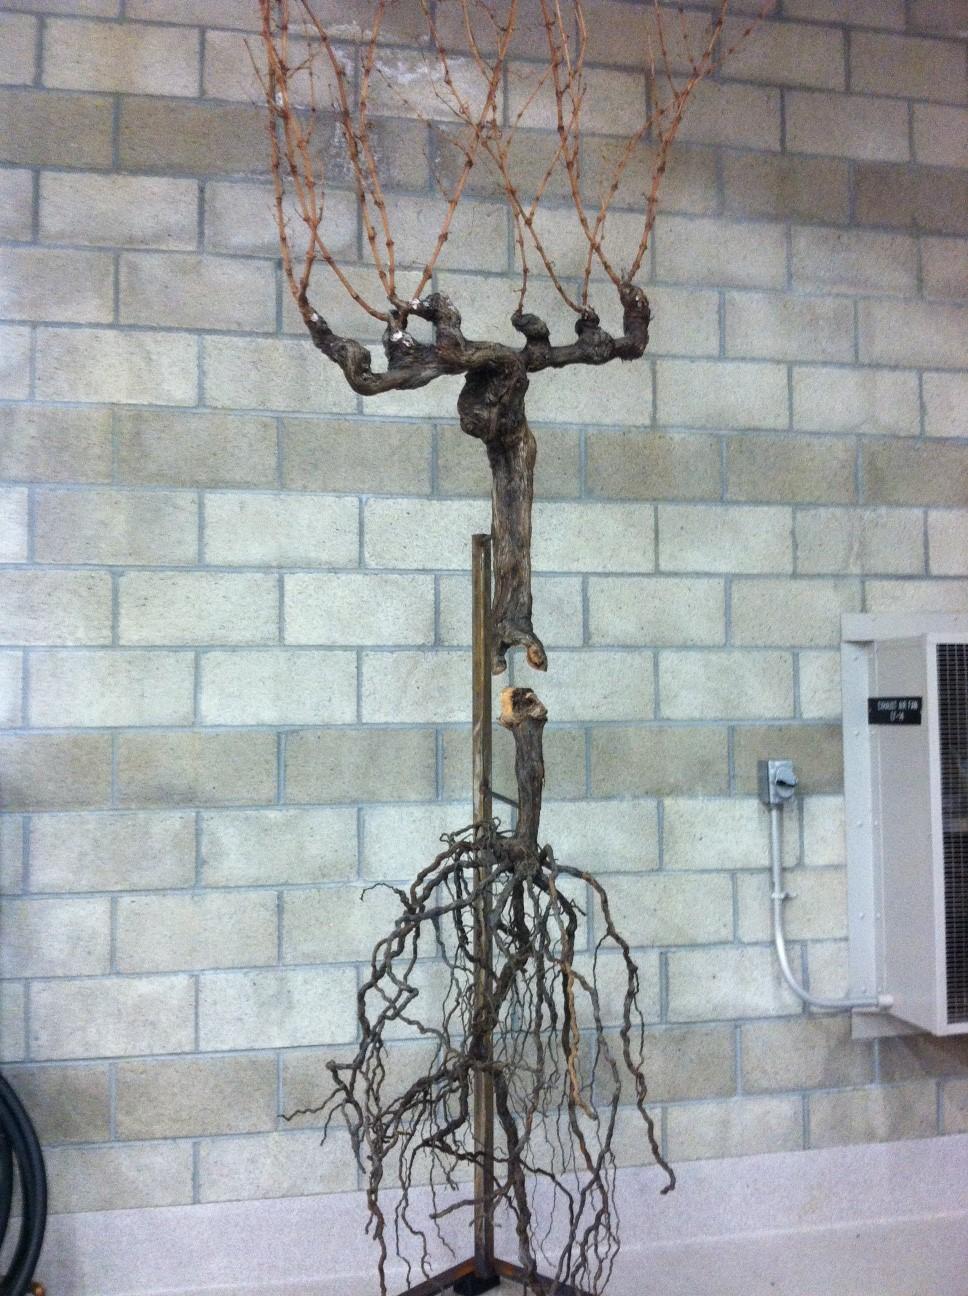 Anatomy of a vine